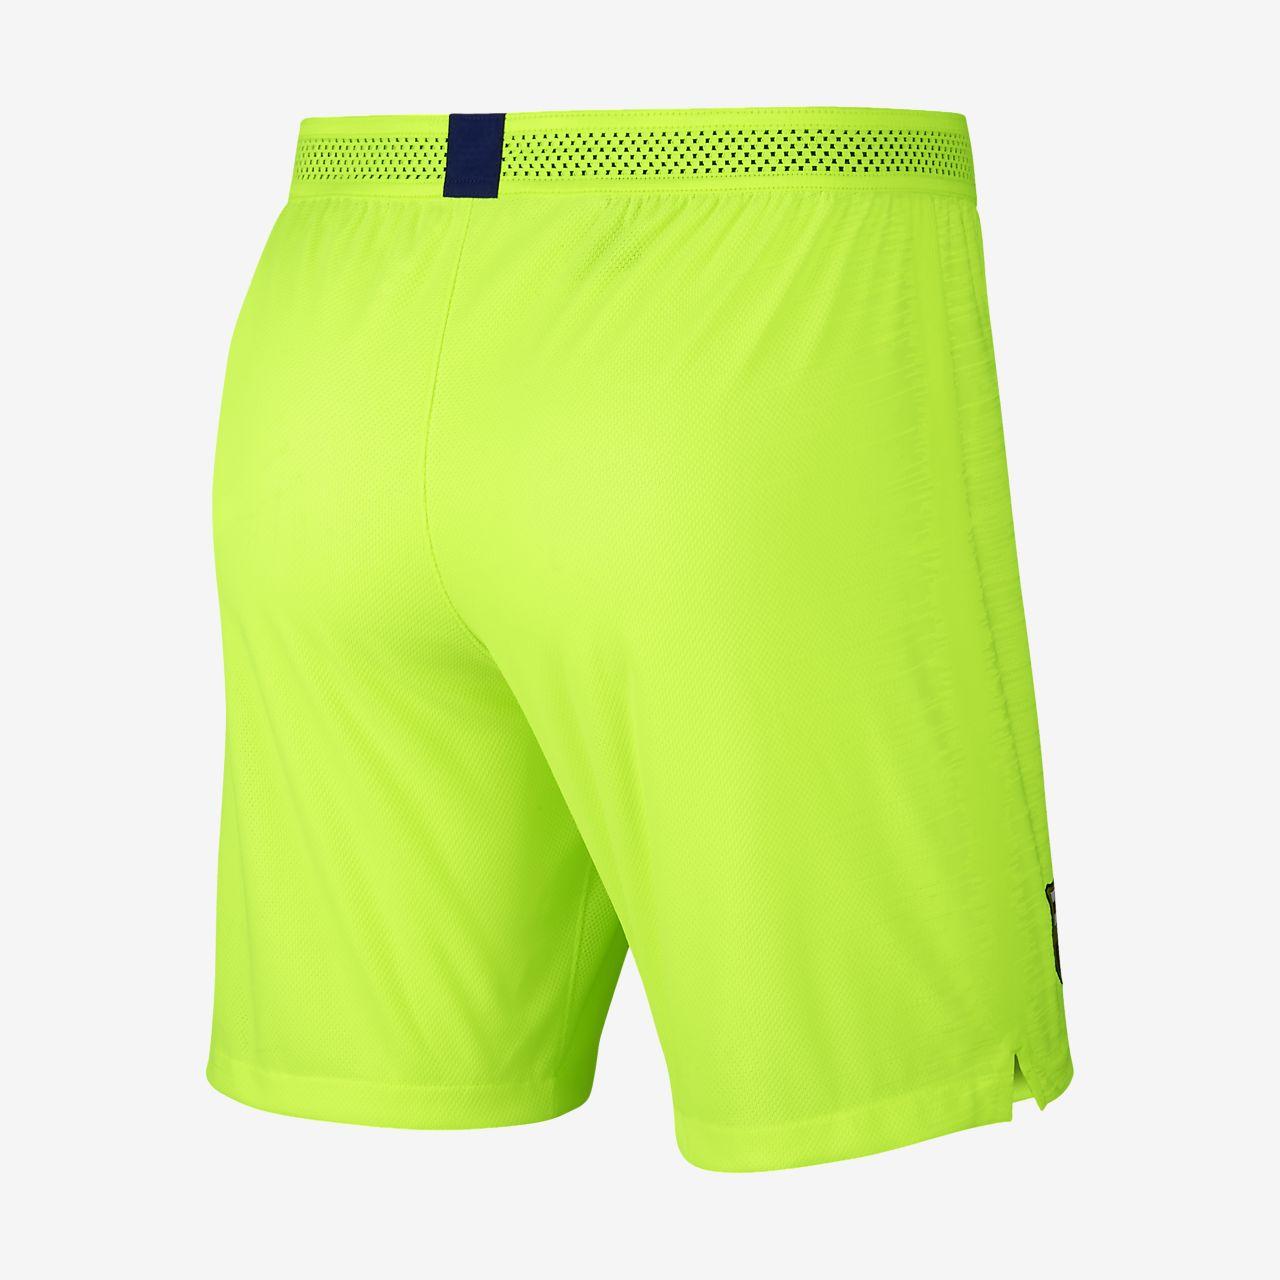 91cd3fcb03a 2018/19 FC Barcelona Vapor Match Away Men's Football Shorts